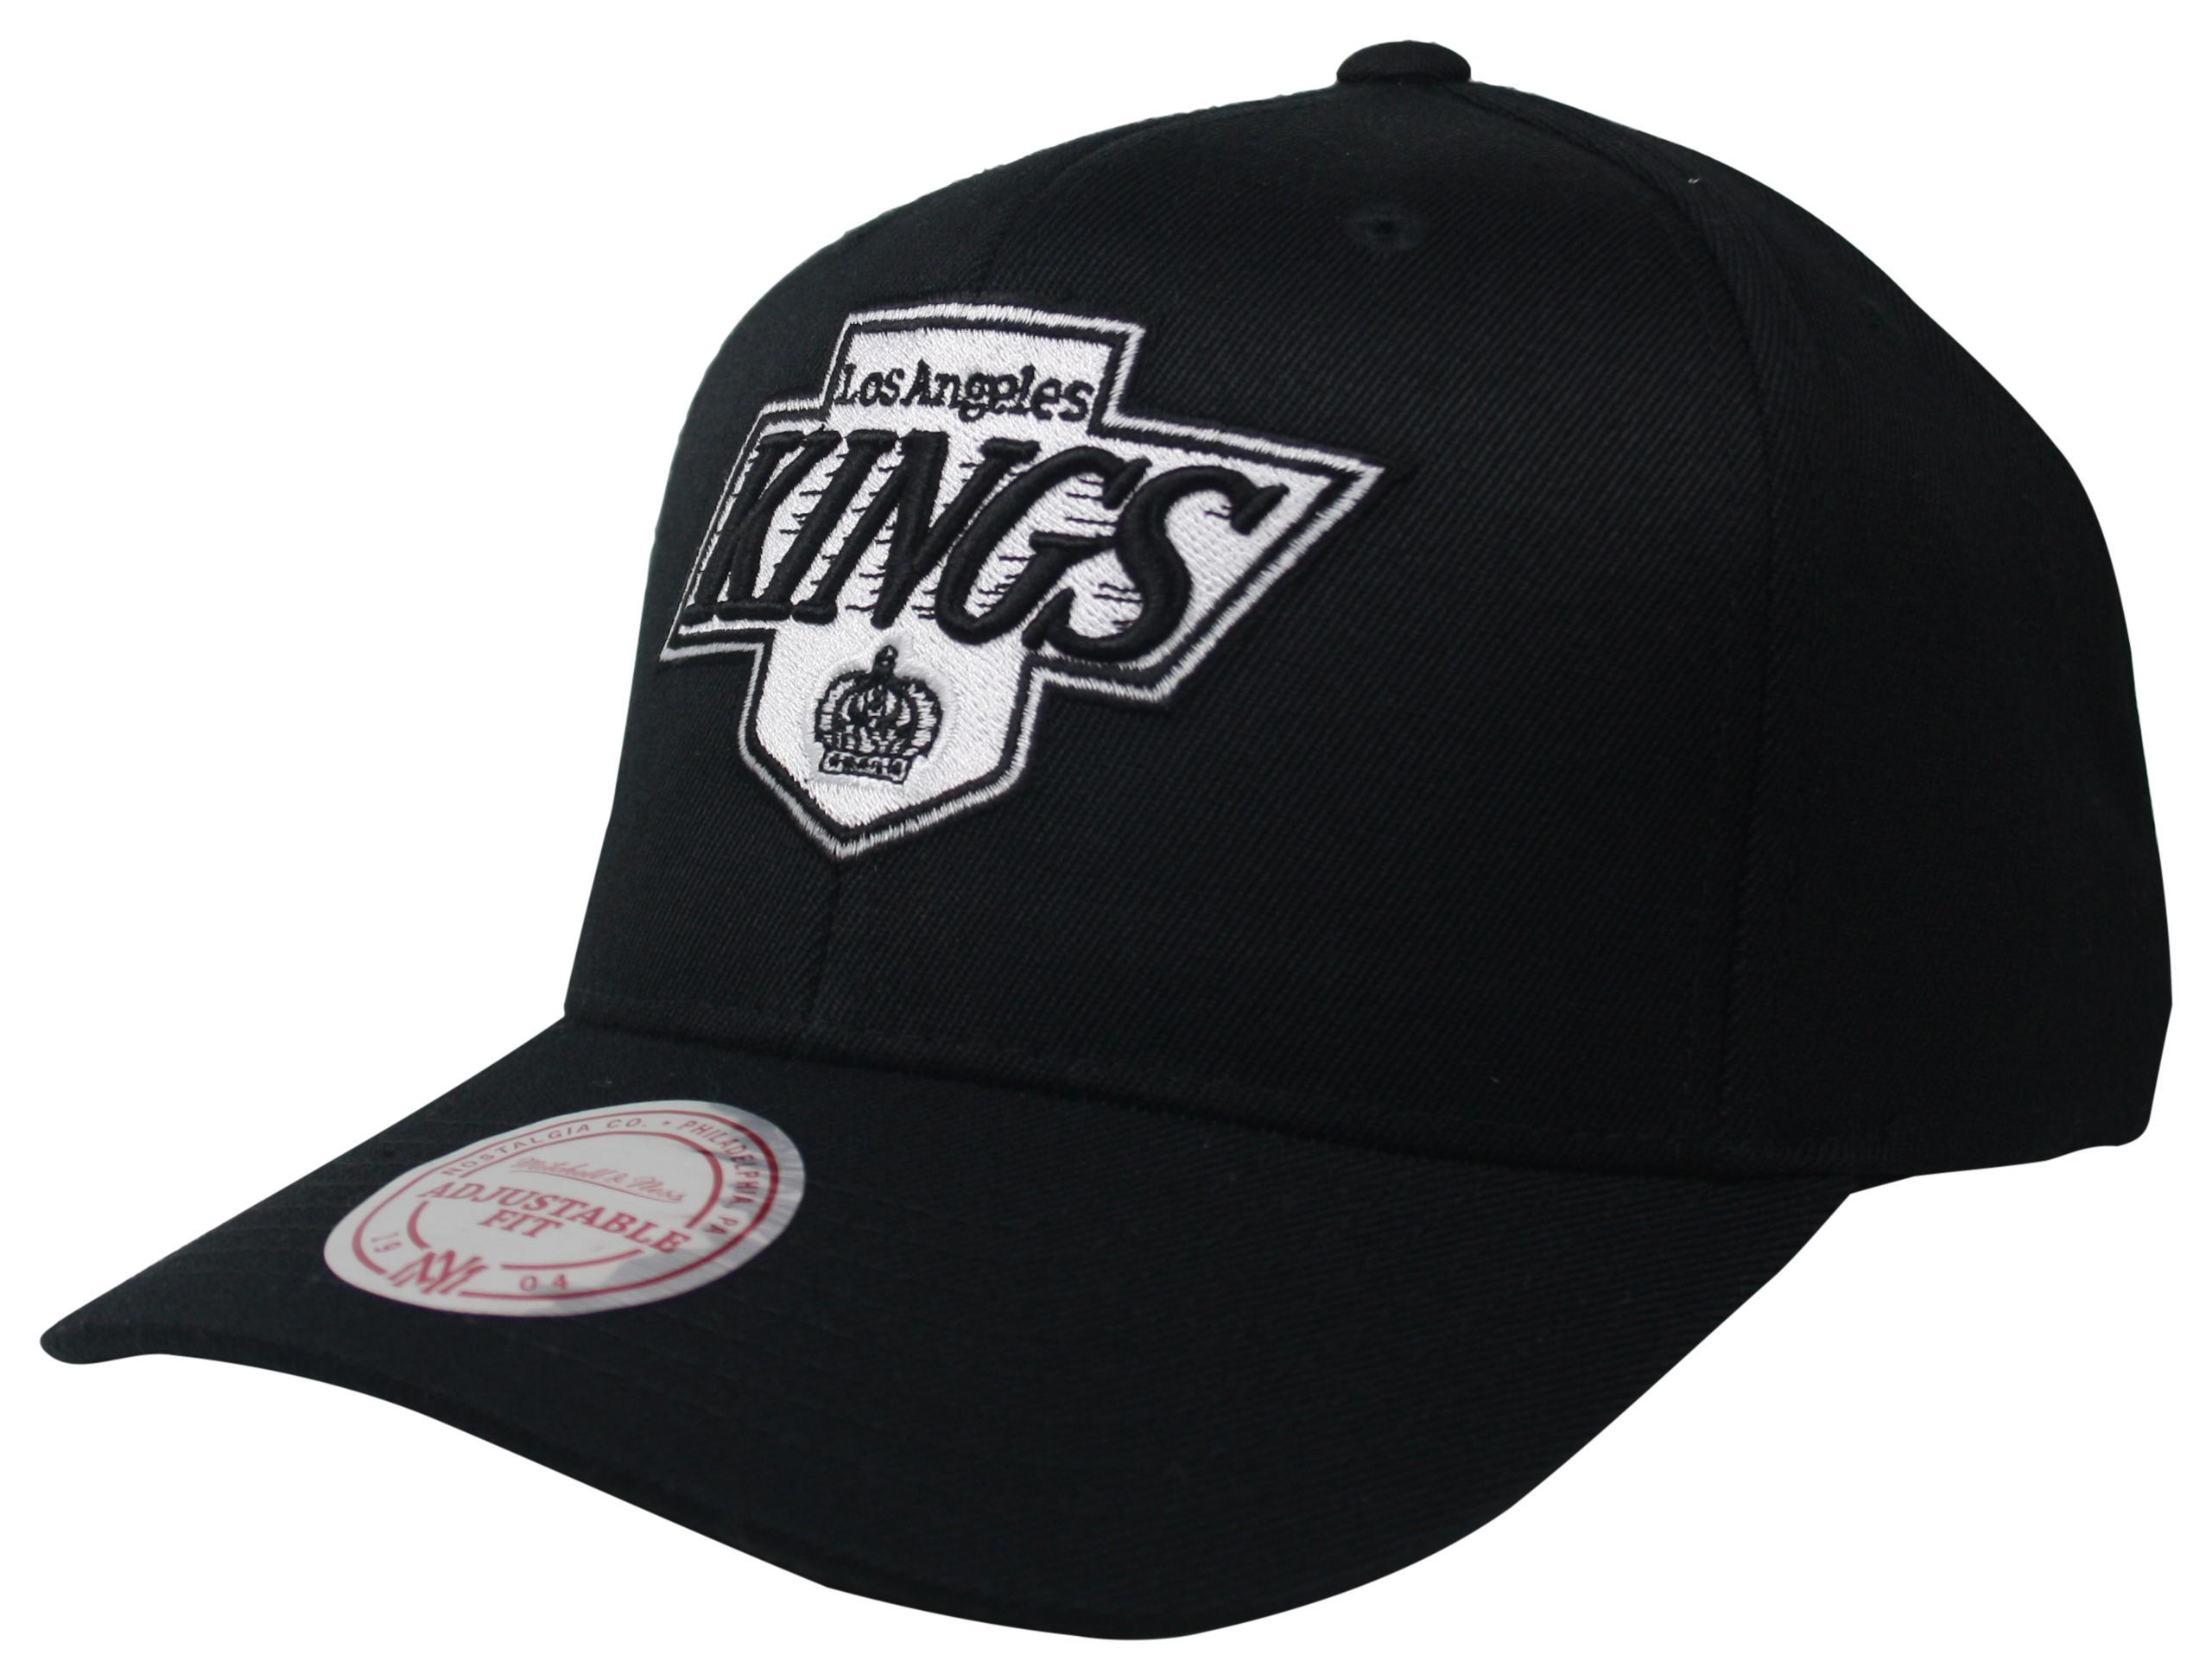 ac3f4ed1f Mitchell & Ness | LA Kings Black Black & White Logo 110 Snapback